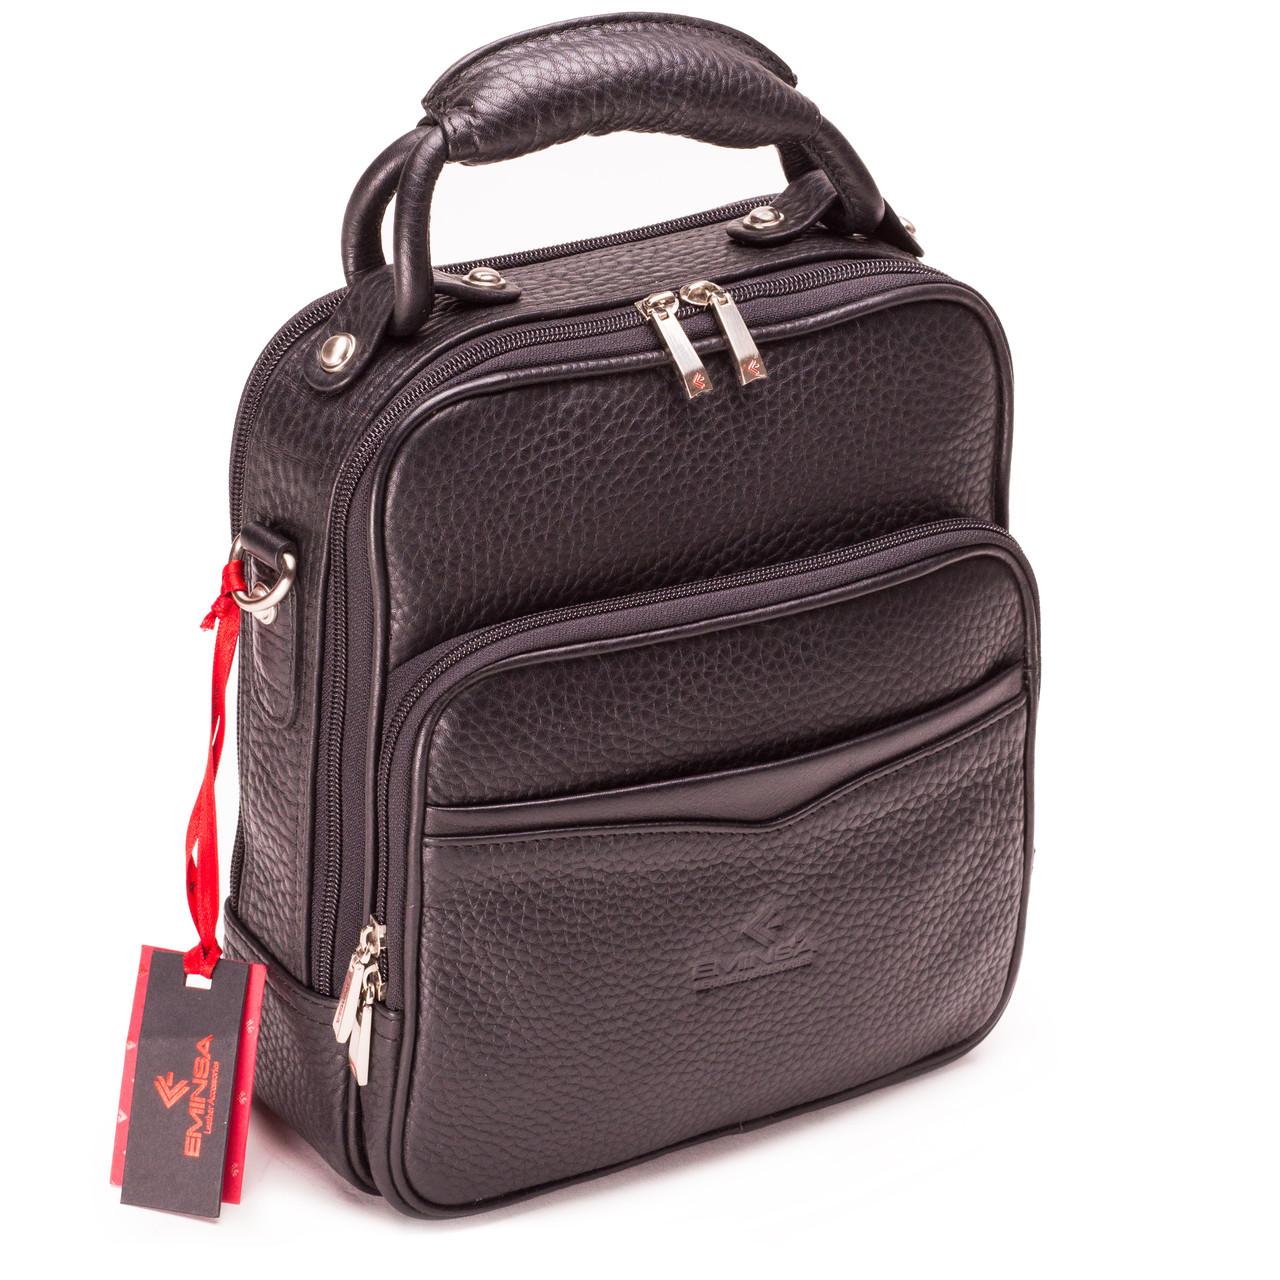 Мужская сумка кожаная черная Eminsa 6006-11-1